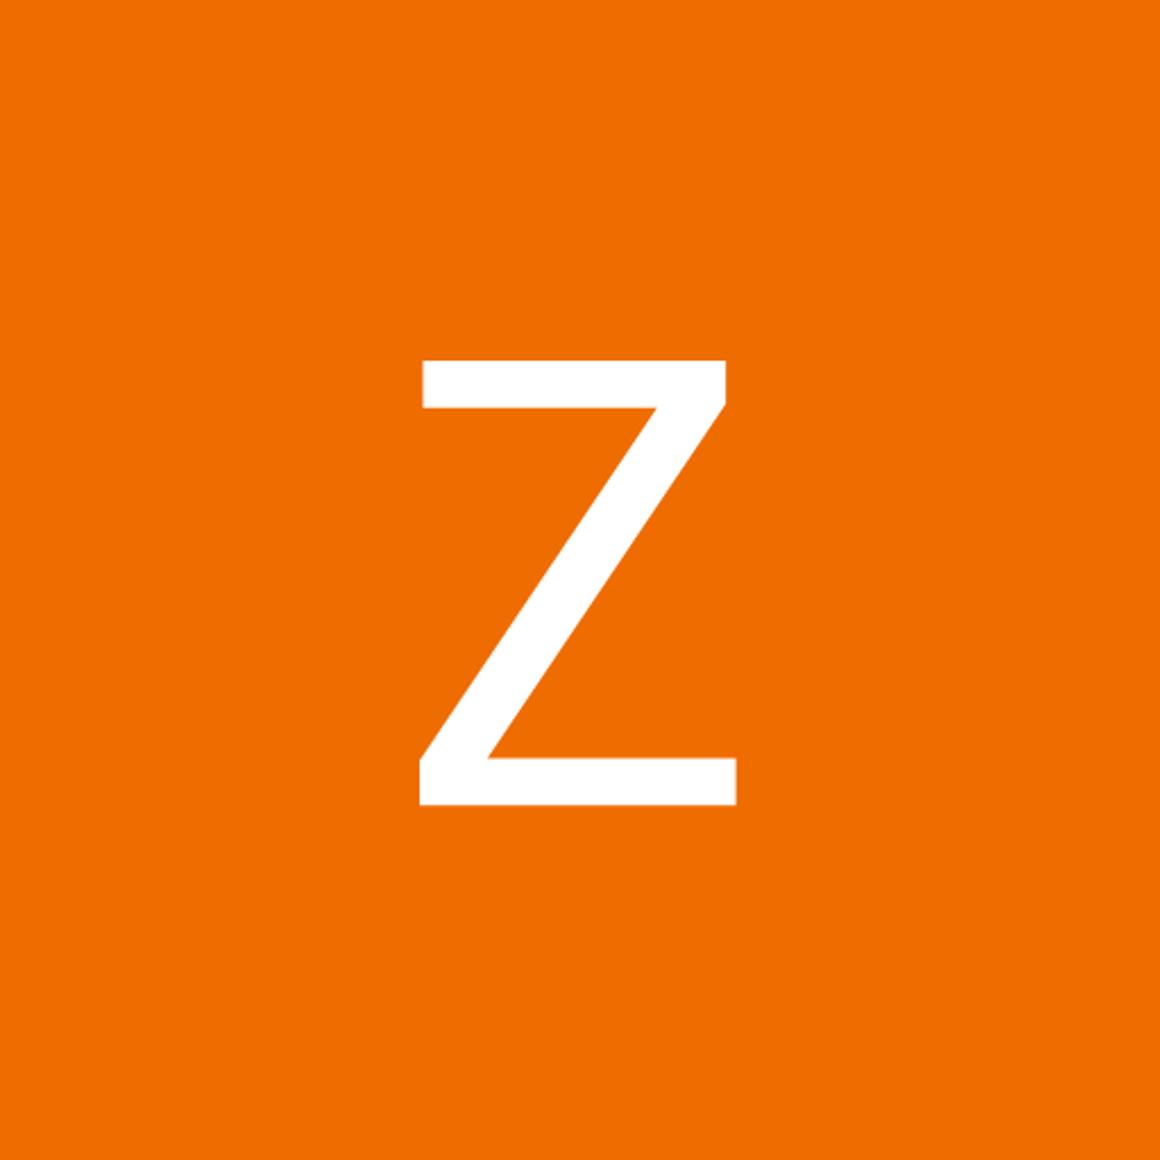 Zylon